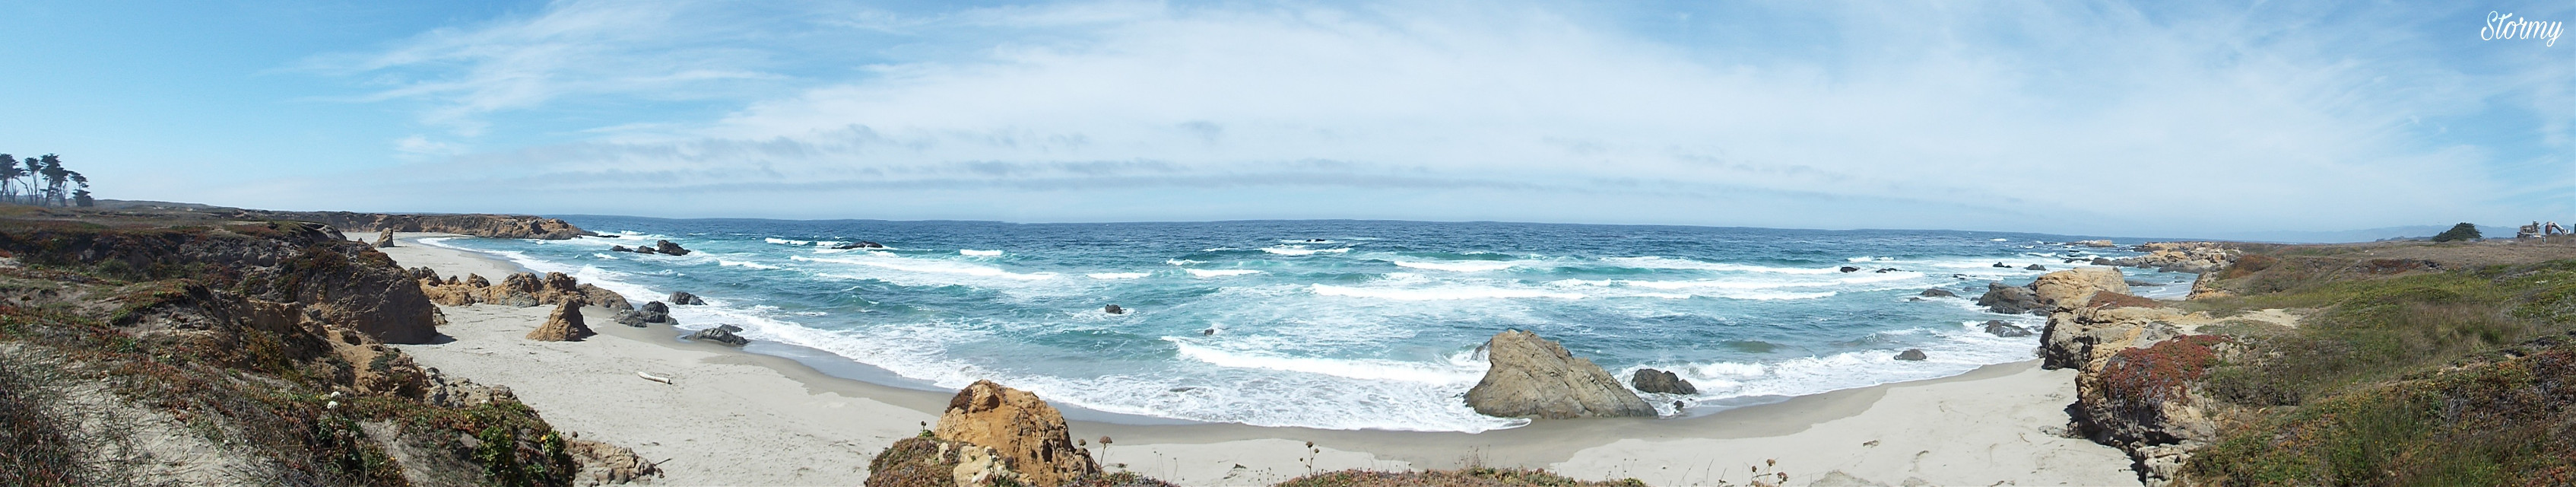 #panorama #beach #shoreline #bluesky #california #norcal #northerncalifornia #calilove #myphoto  #originalphotobyme #stormEday